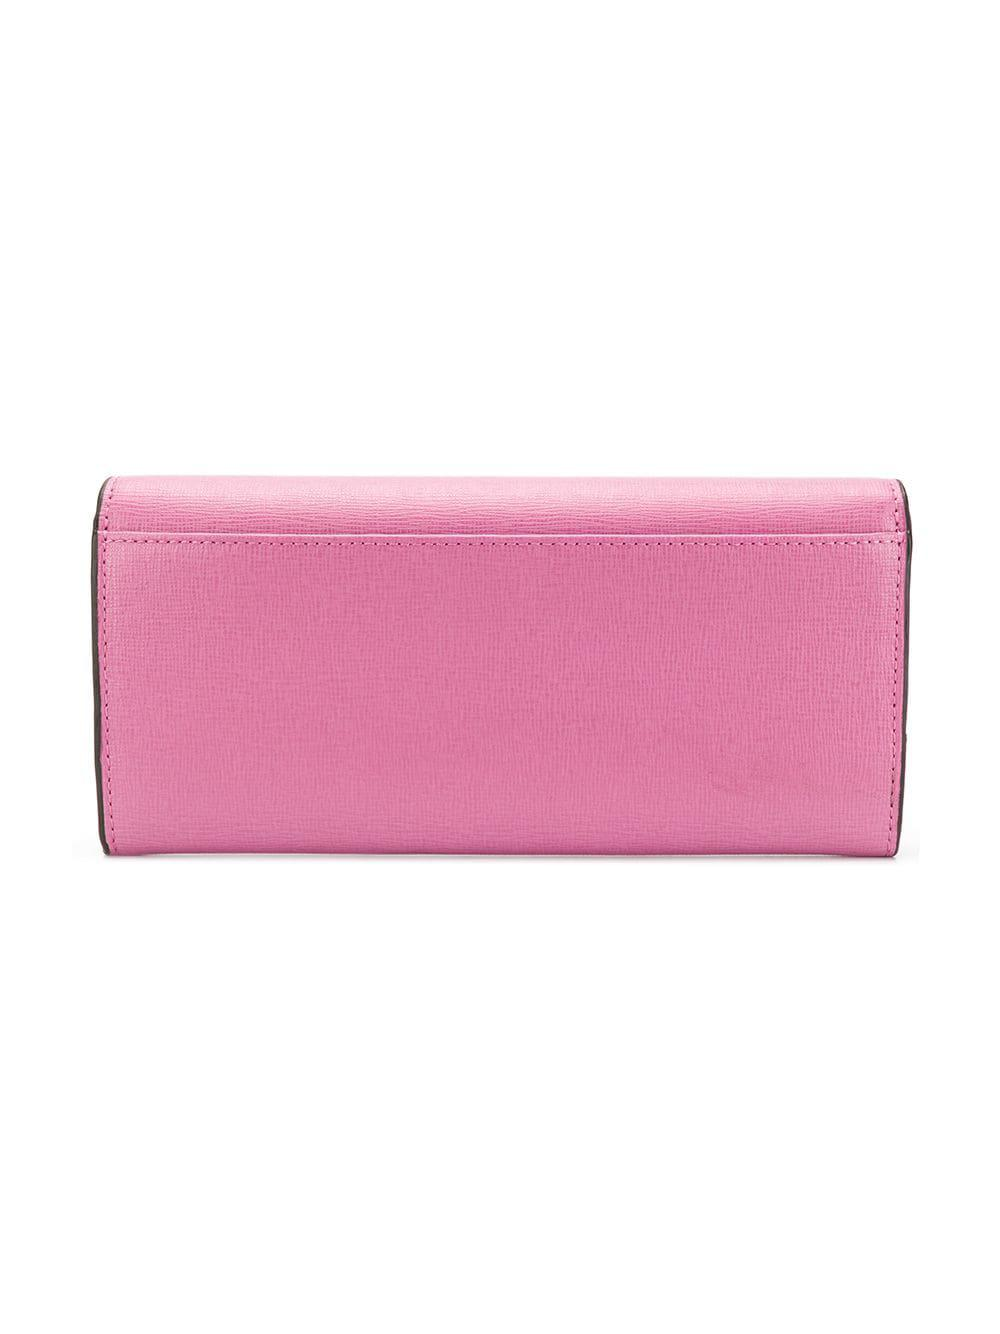 Furla Lyst Wallet Bi Pink Fold AqYRA